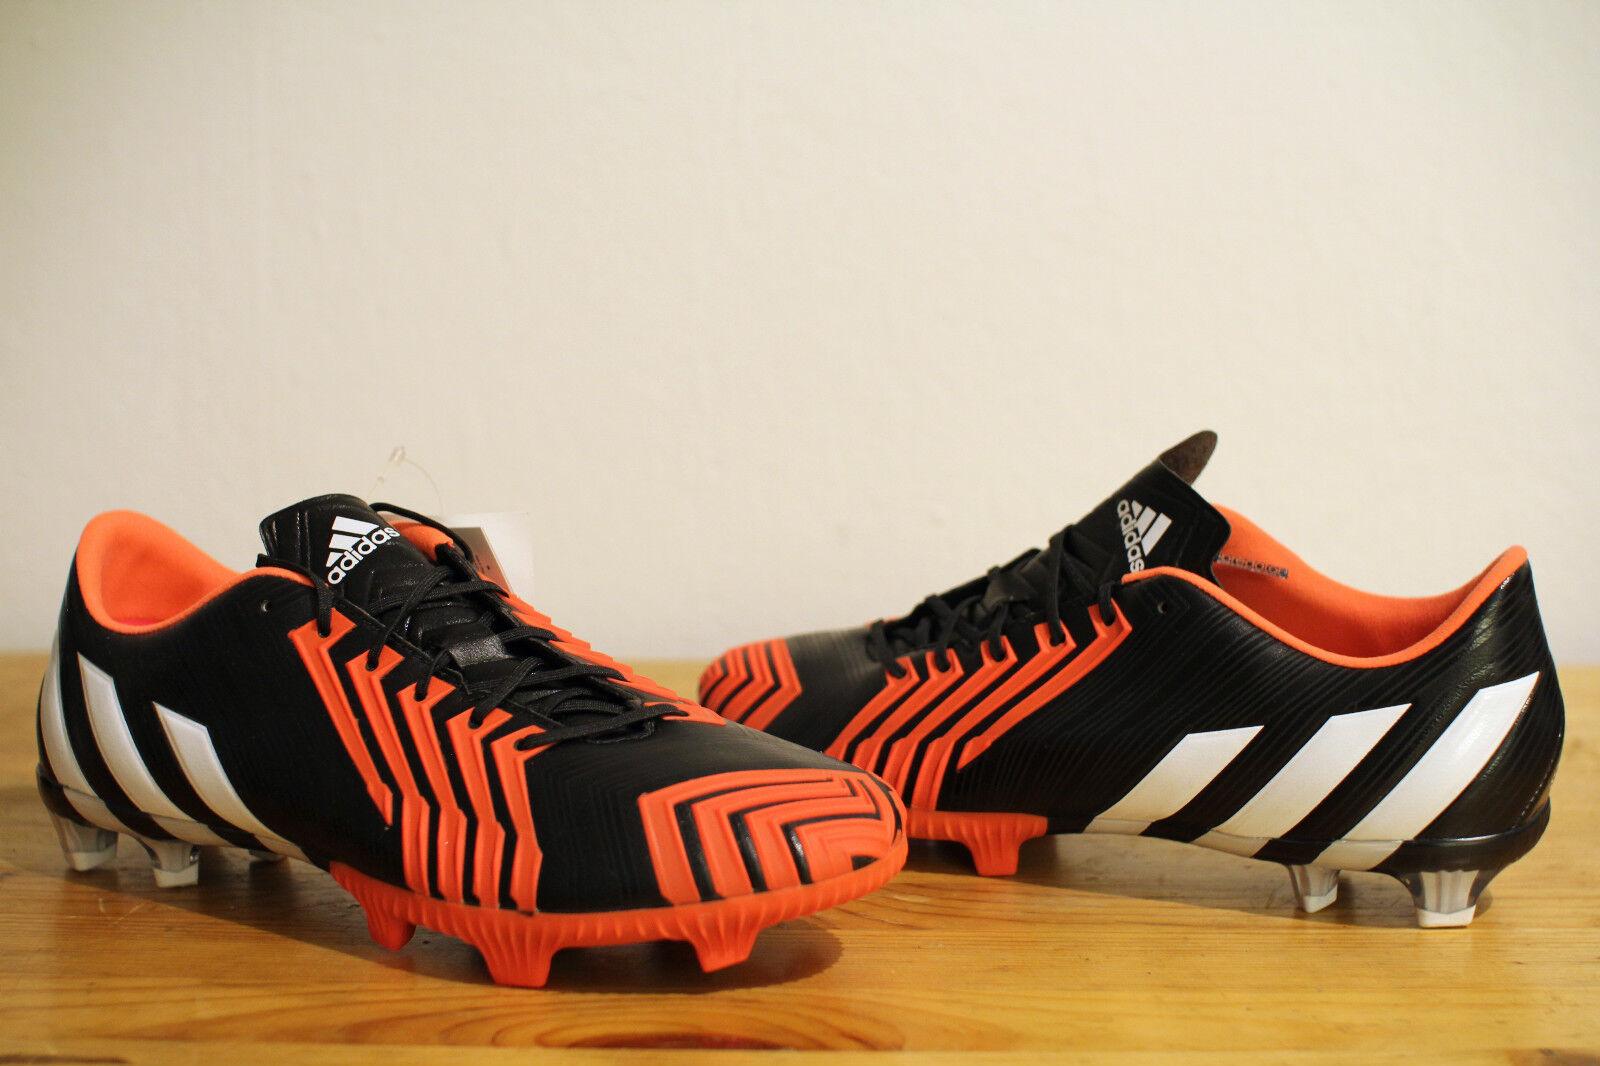 Adidas Predator Instinct FG black red Gr. 40,41,42 NEU & OVP